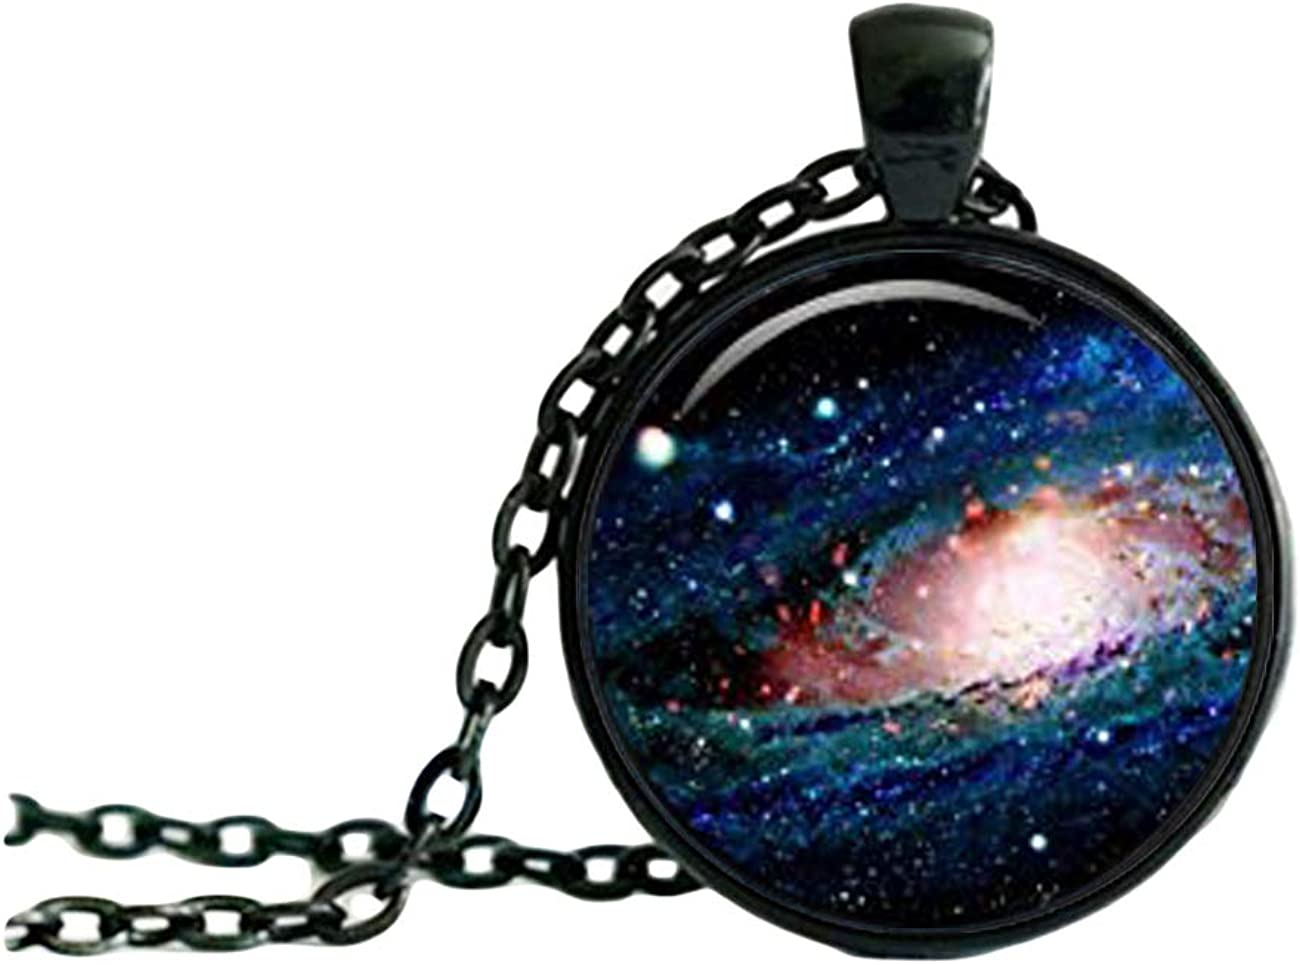 Charm Galaxy Pendant Nebula NECKLACE, Black Jewelery, Charm Pendant, Dome glass jewelry, pure hand-made